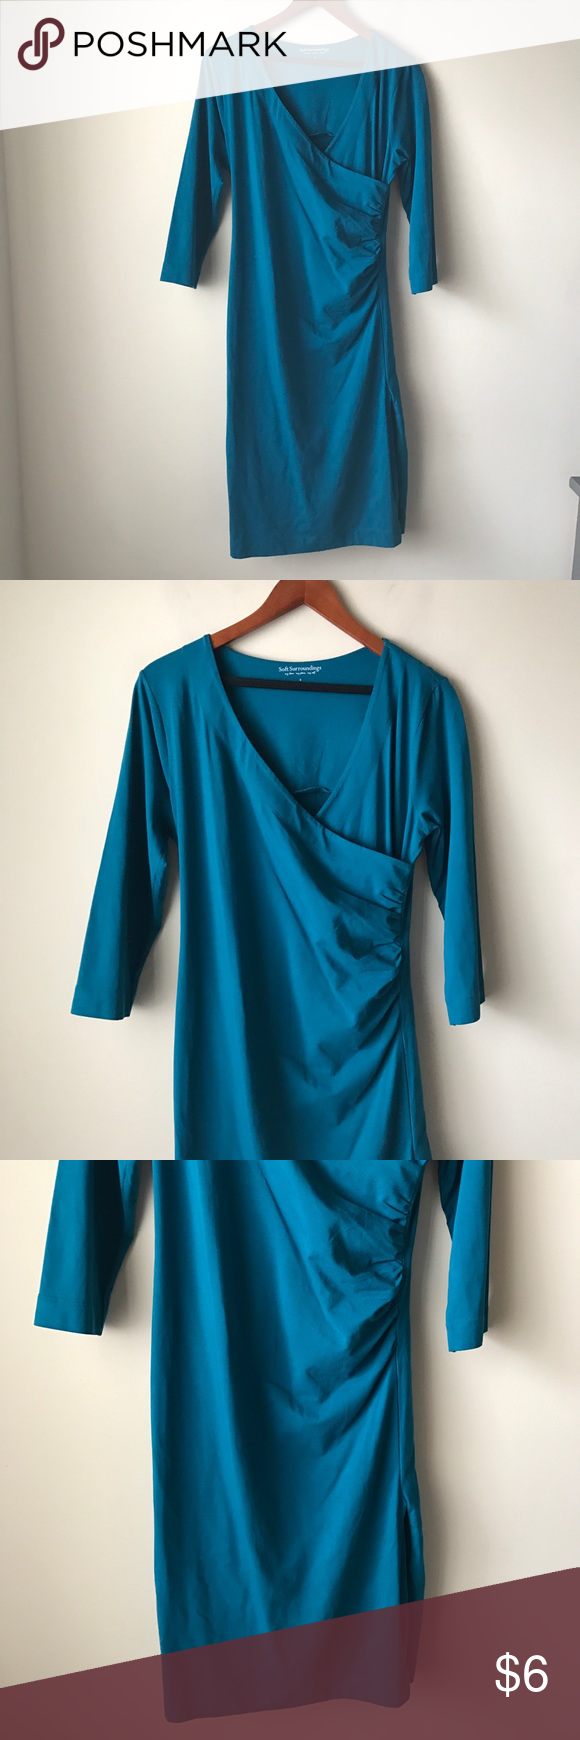 Soft Surroundings teal dress Teal faux wrap dress - surplice neckline - three quarter sleeves - size S Soft Surroundings Dresses